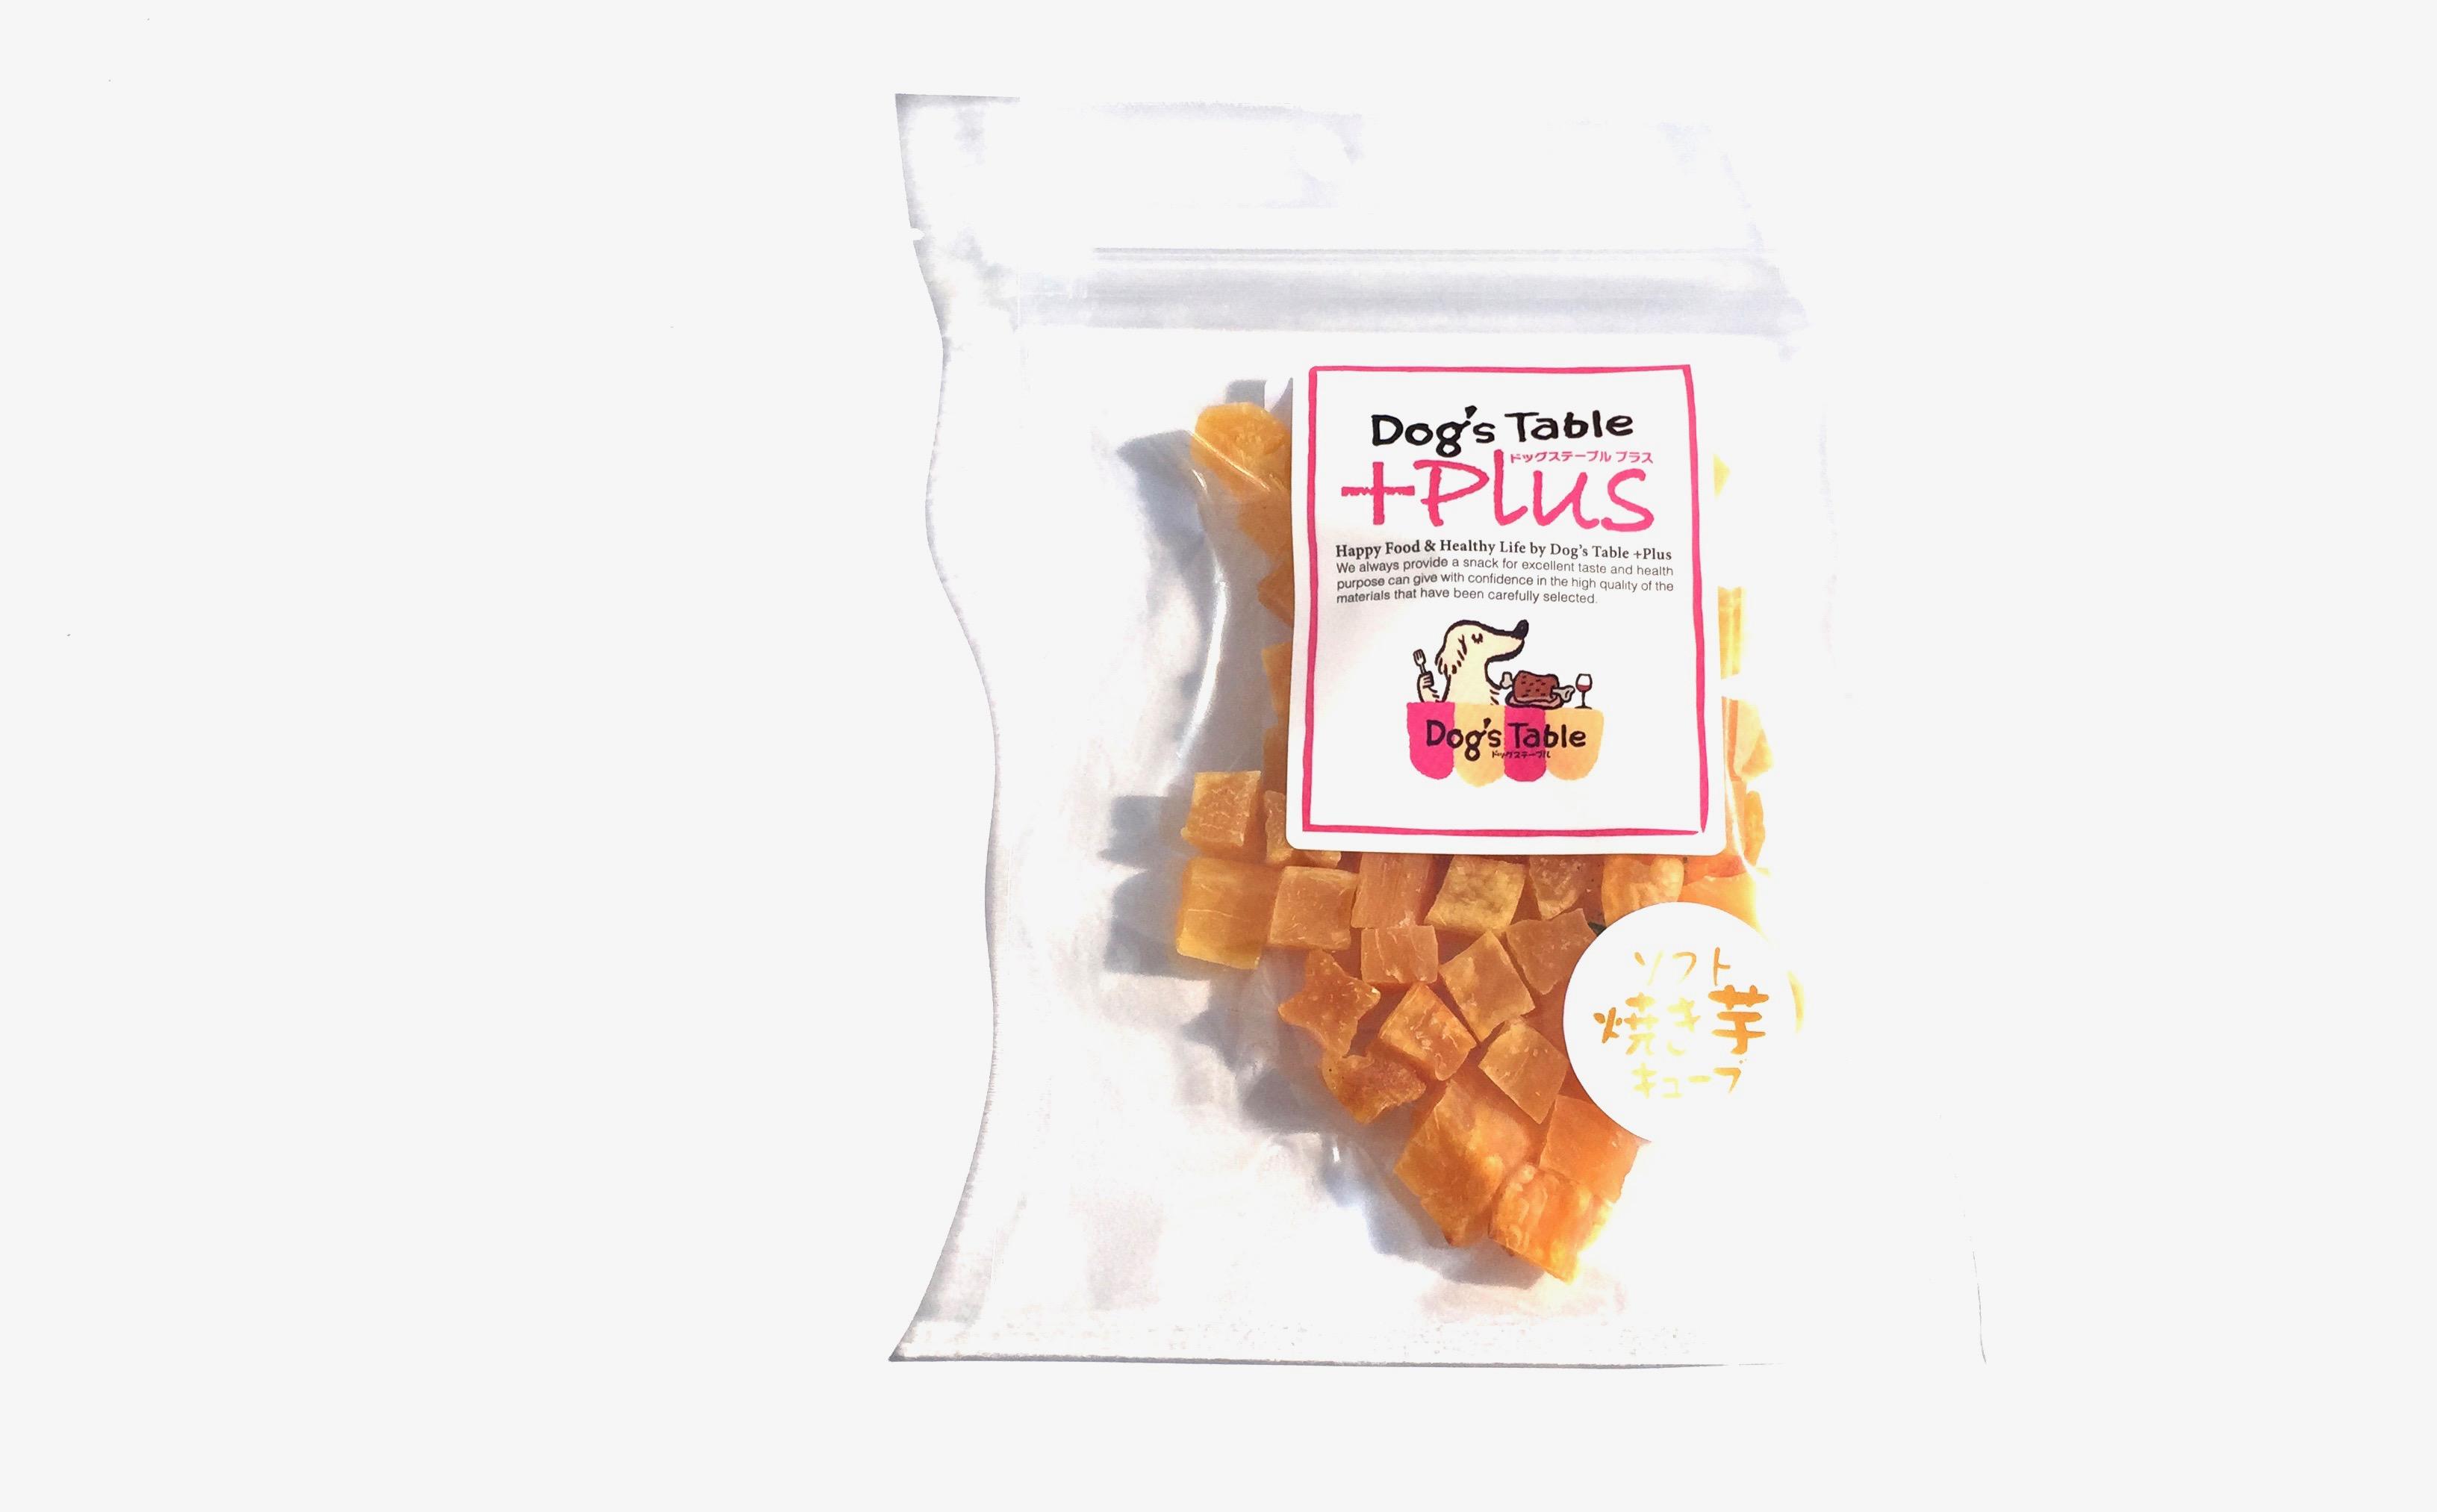 Dog\'s Table + Plus ドッグステーブル プラス 焼き芋 キューブ ソフト_d0217958_11471545.jpg